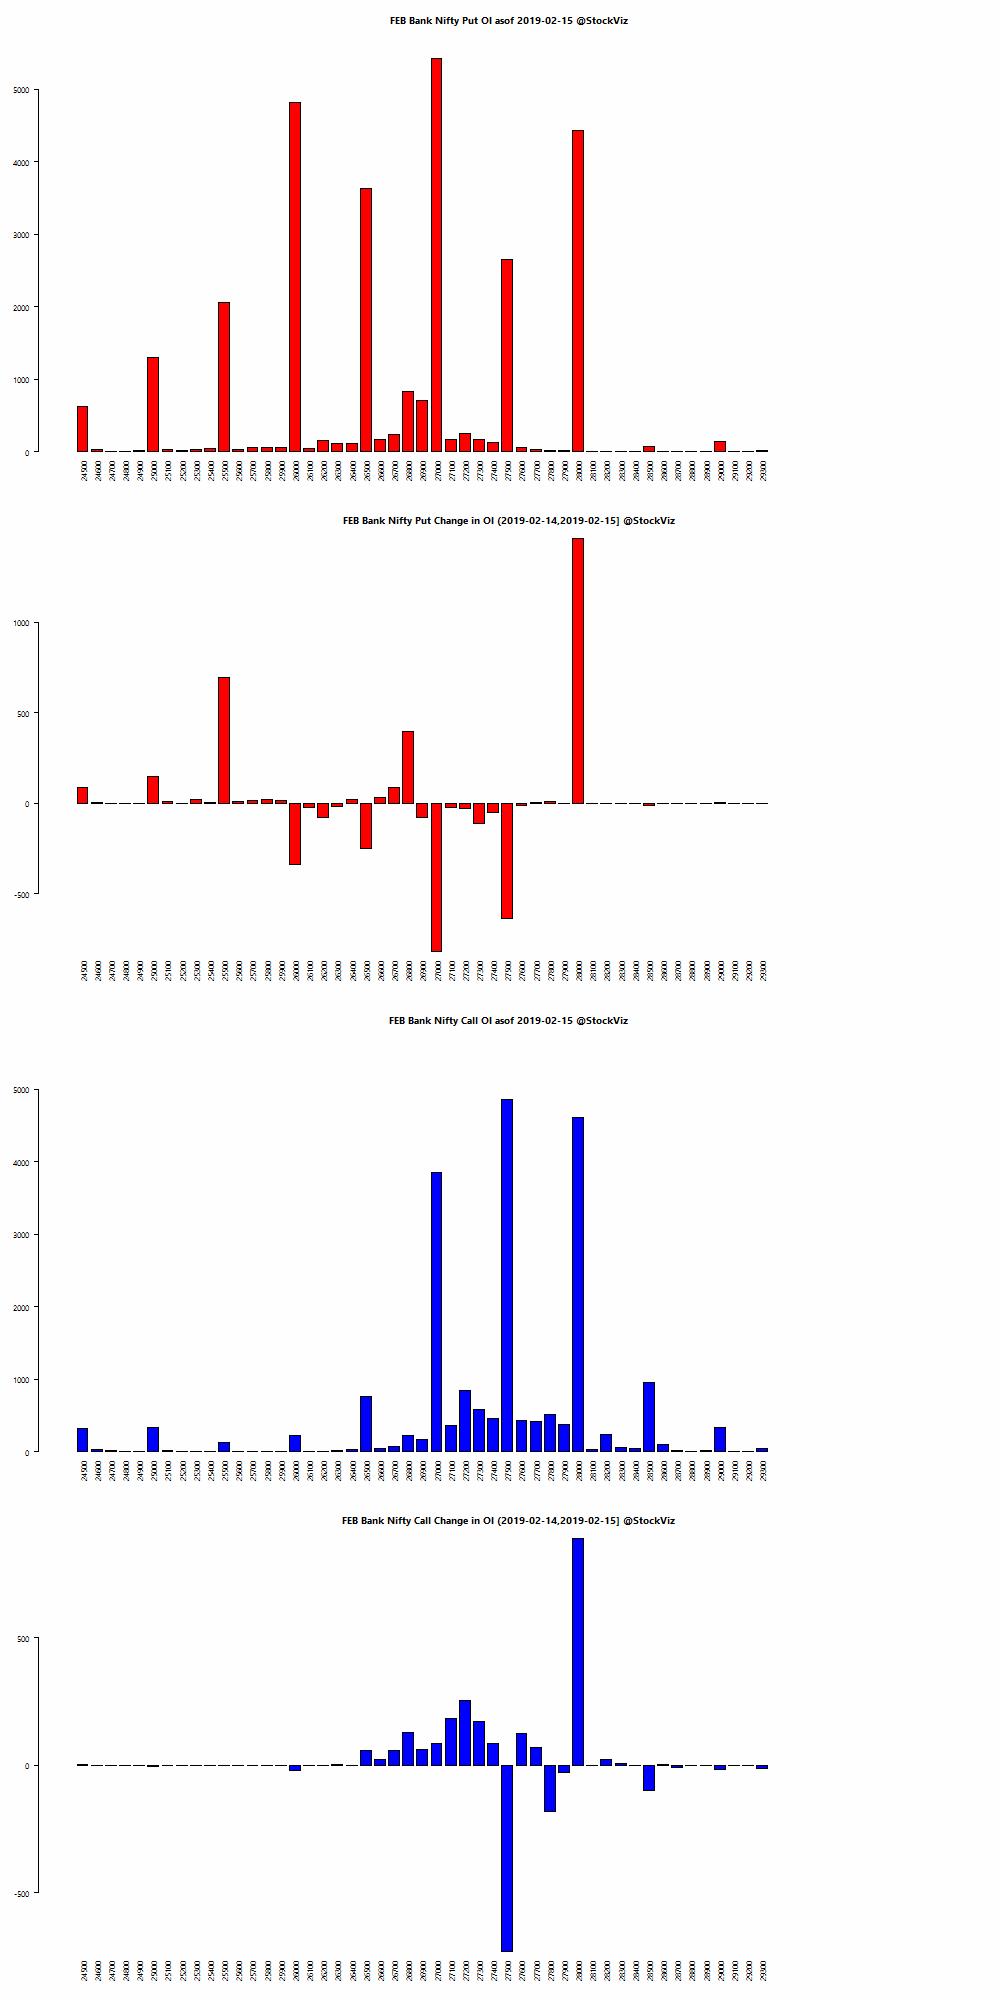 FEB BANKNIFTY OI chart